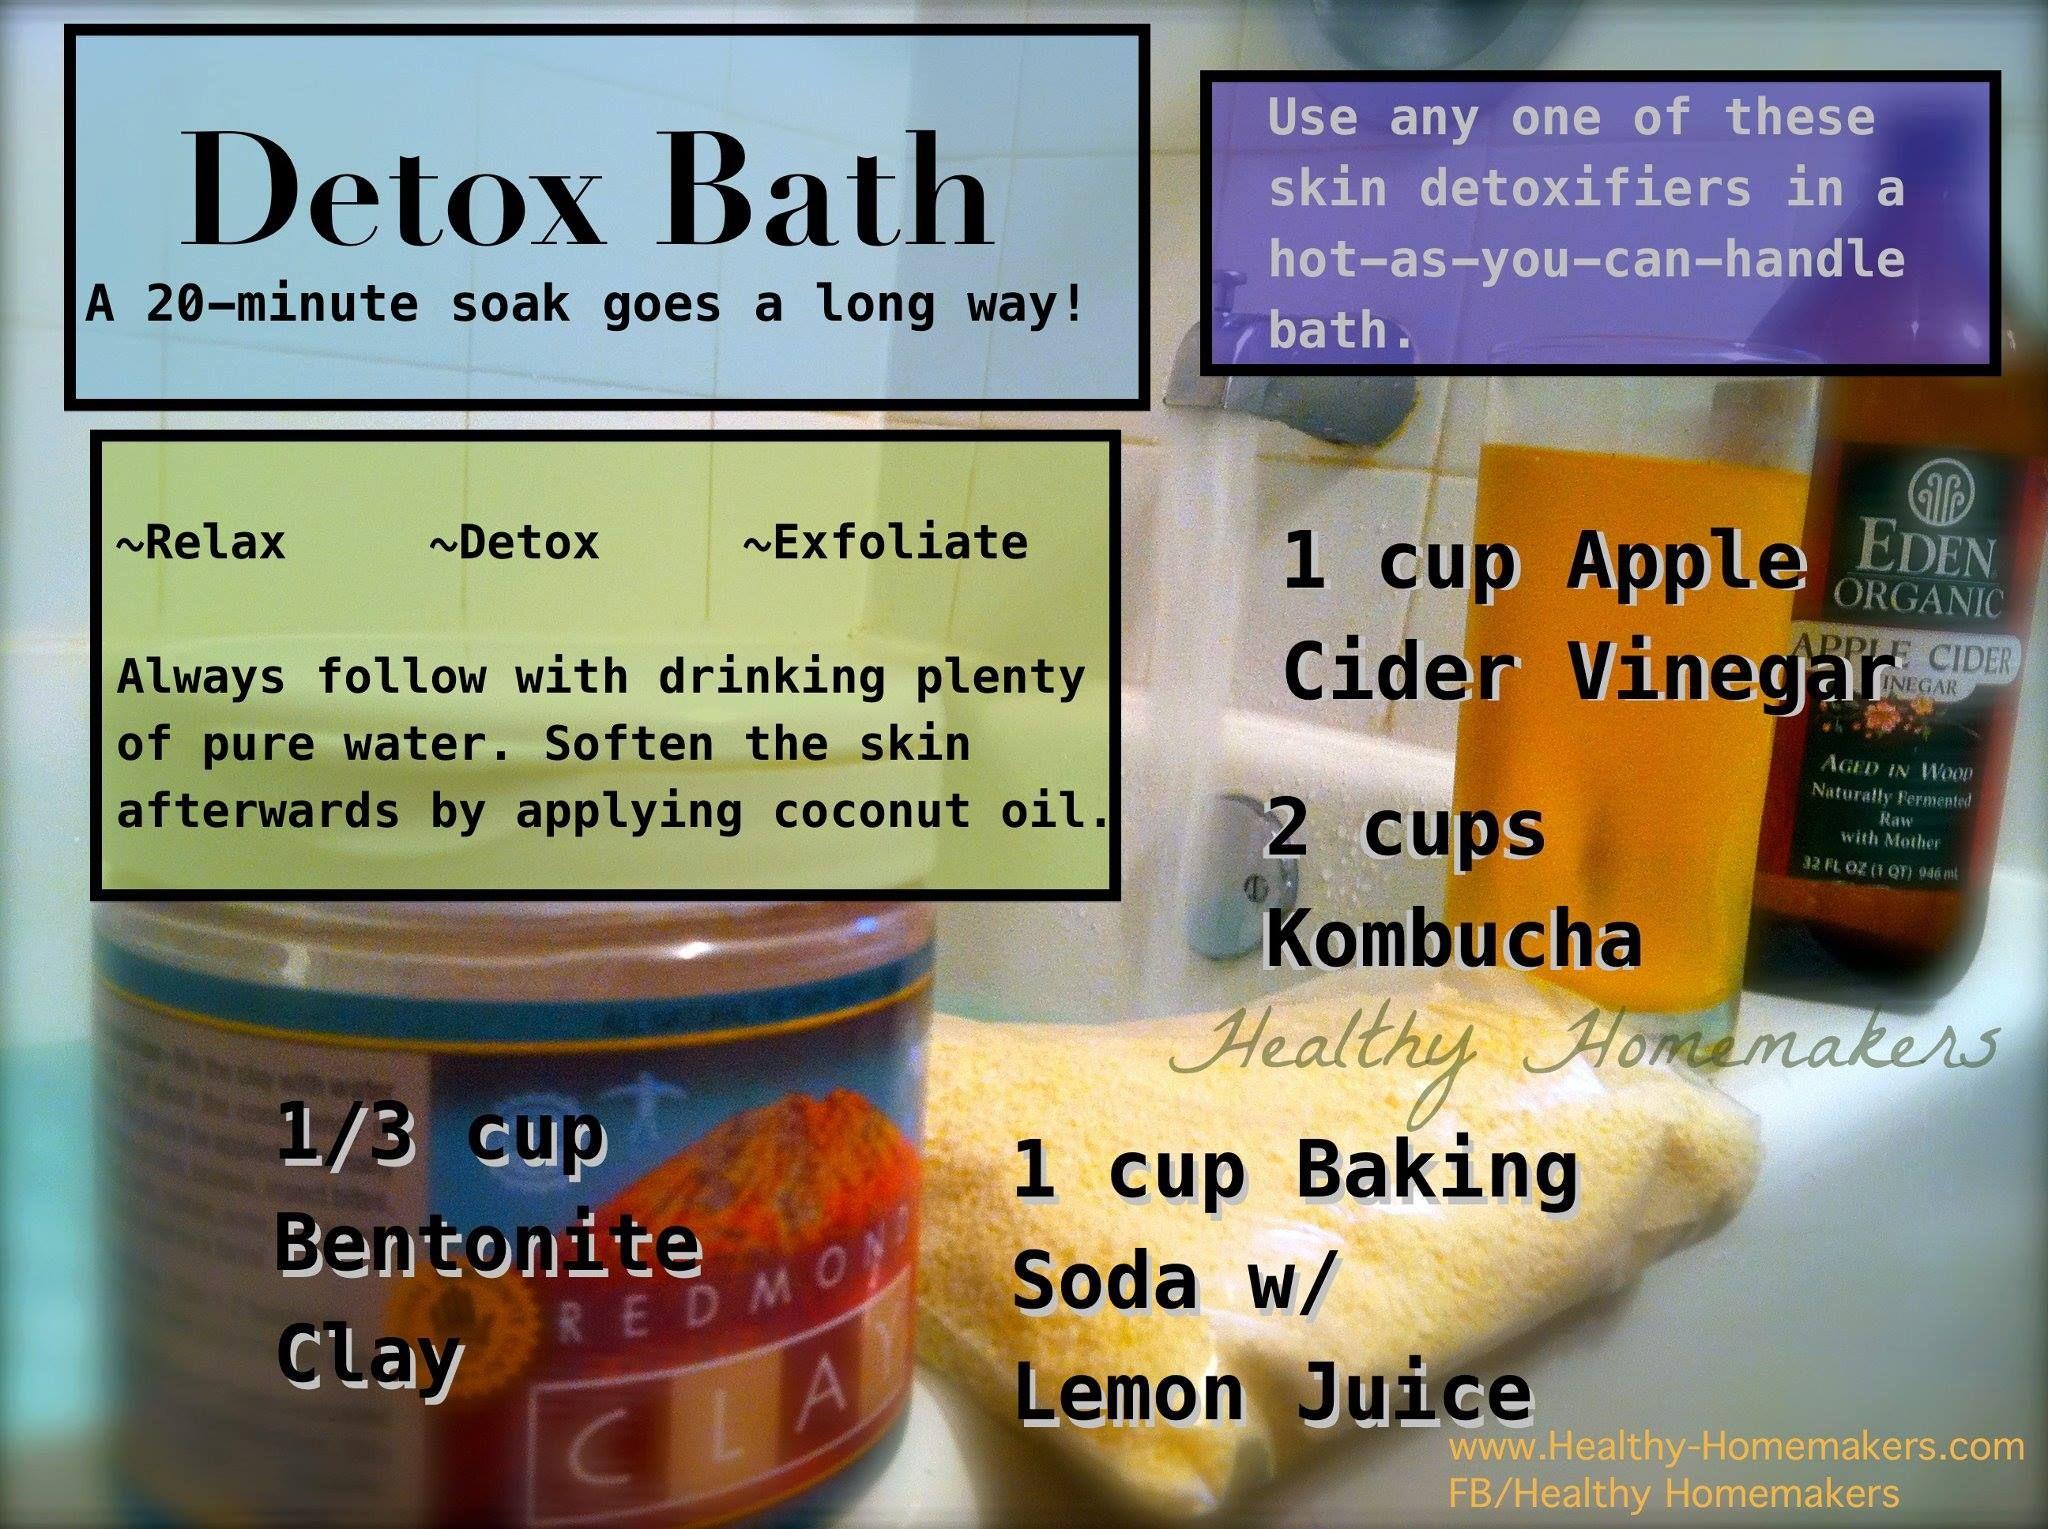 Easy natural detox bath - the best crunchy way to bathe